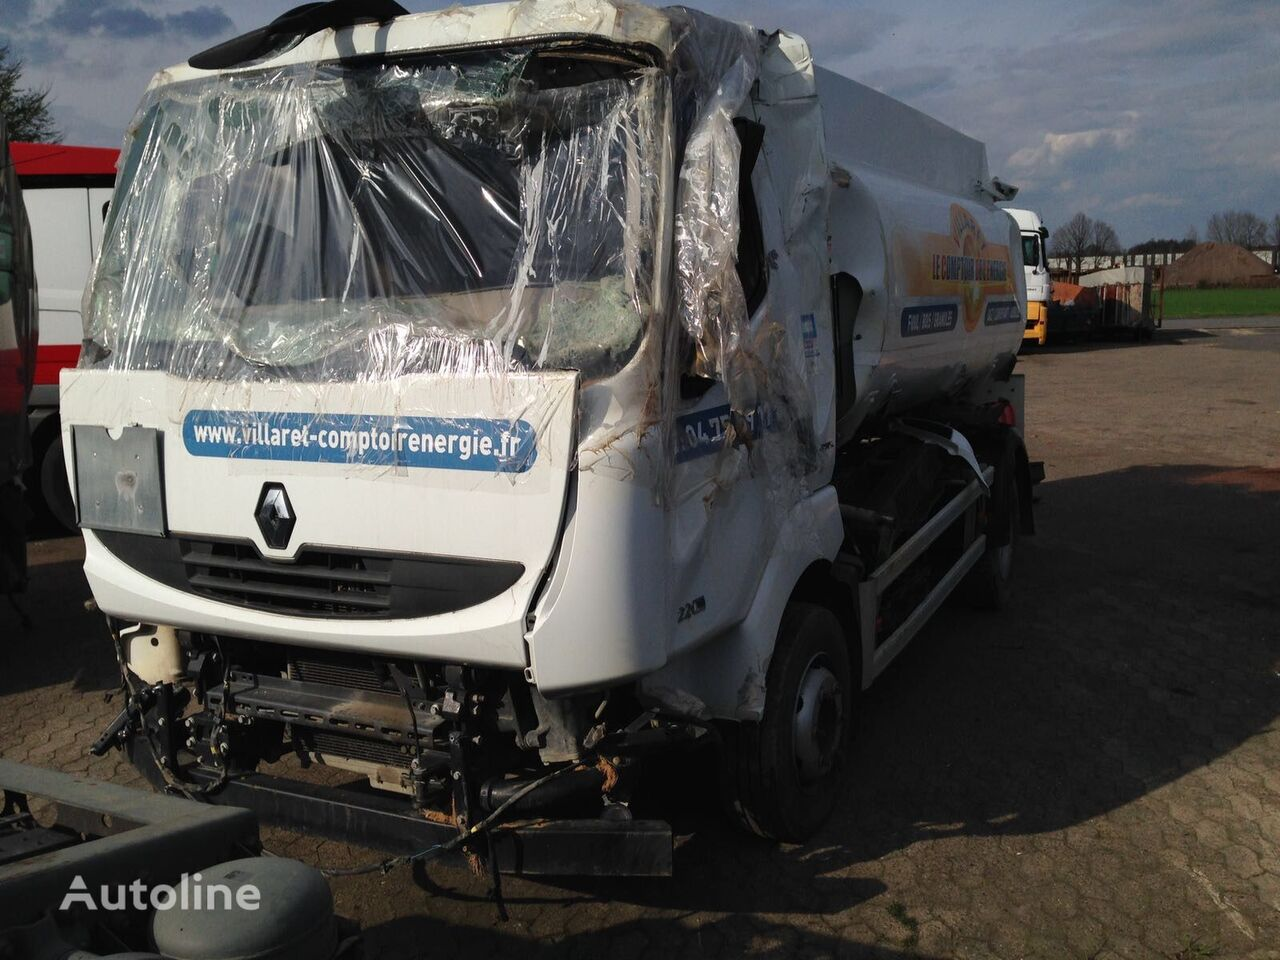 damaged RENAULT MIDLUM 220 DXI fuel truck